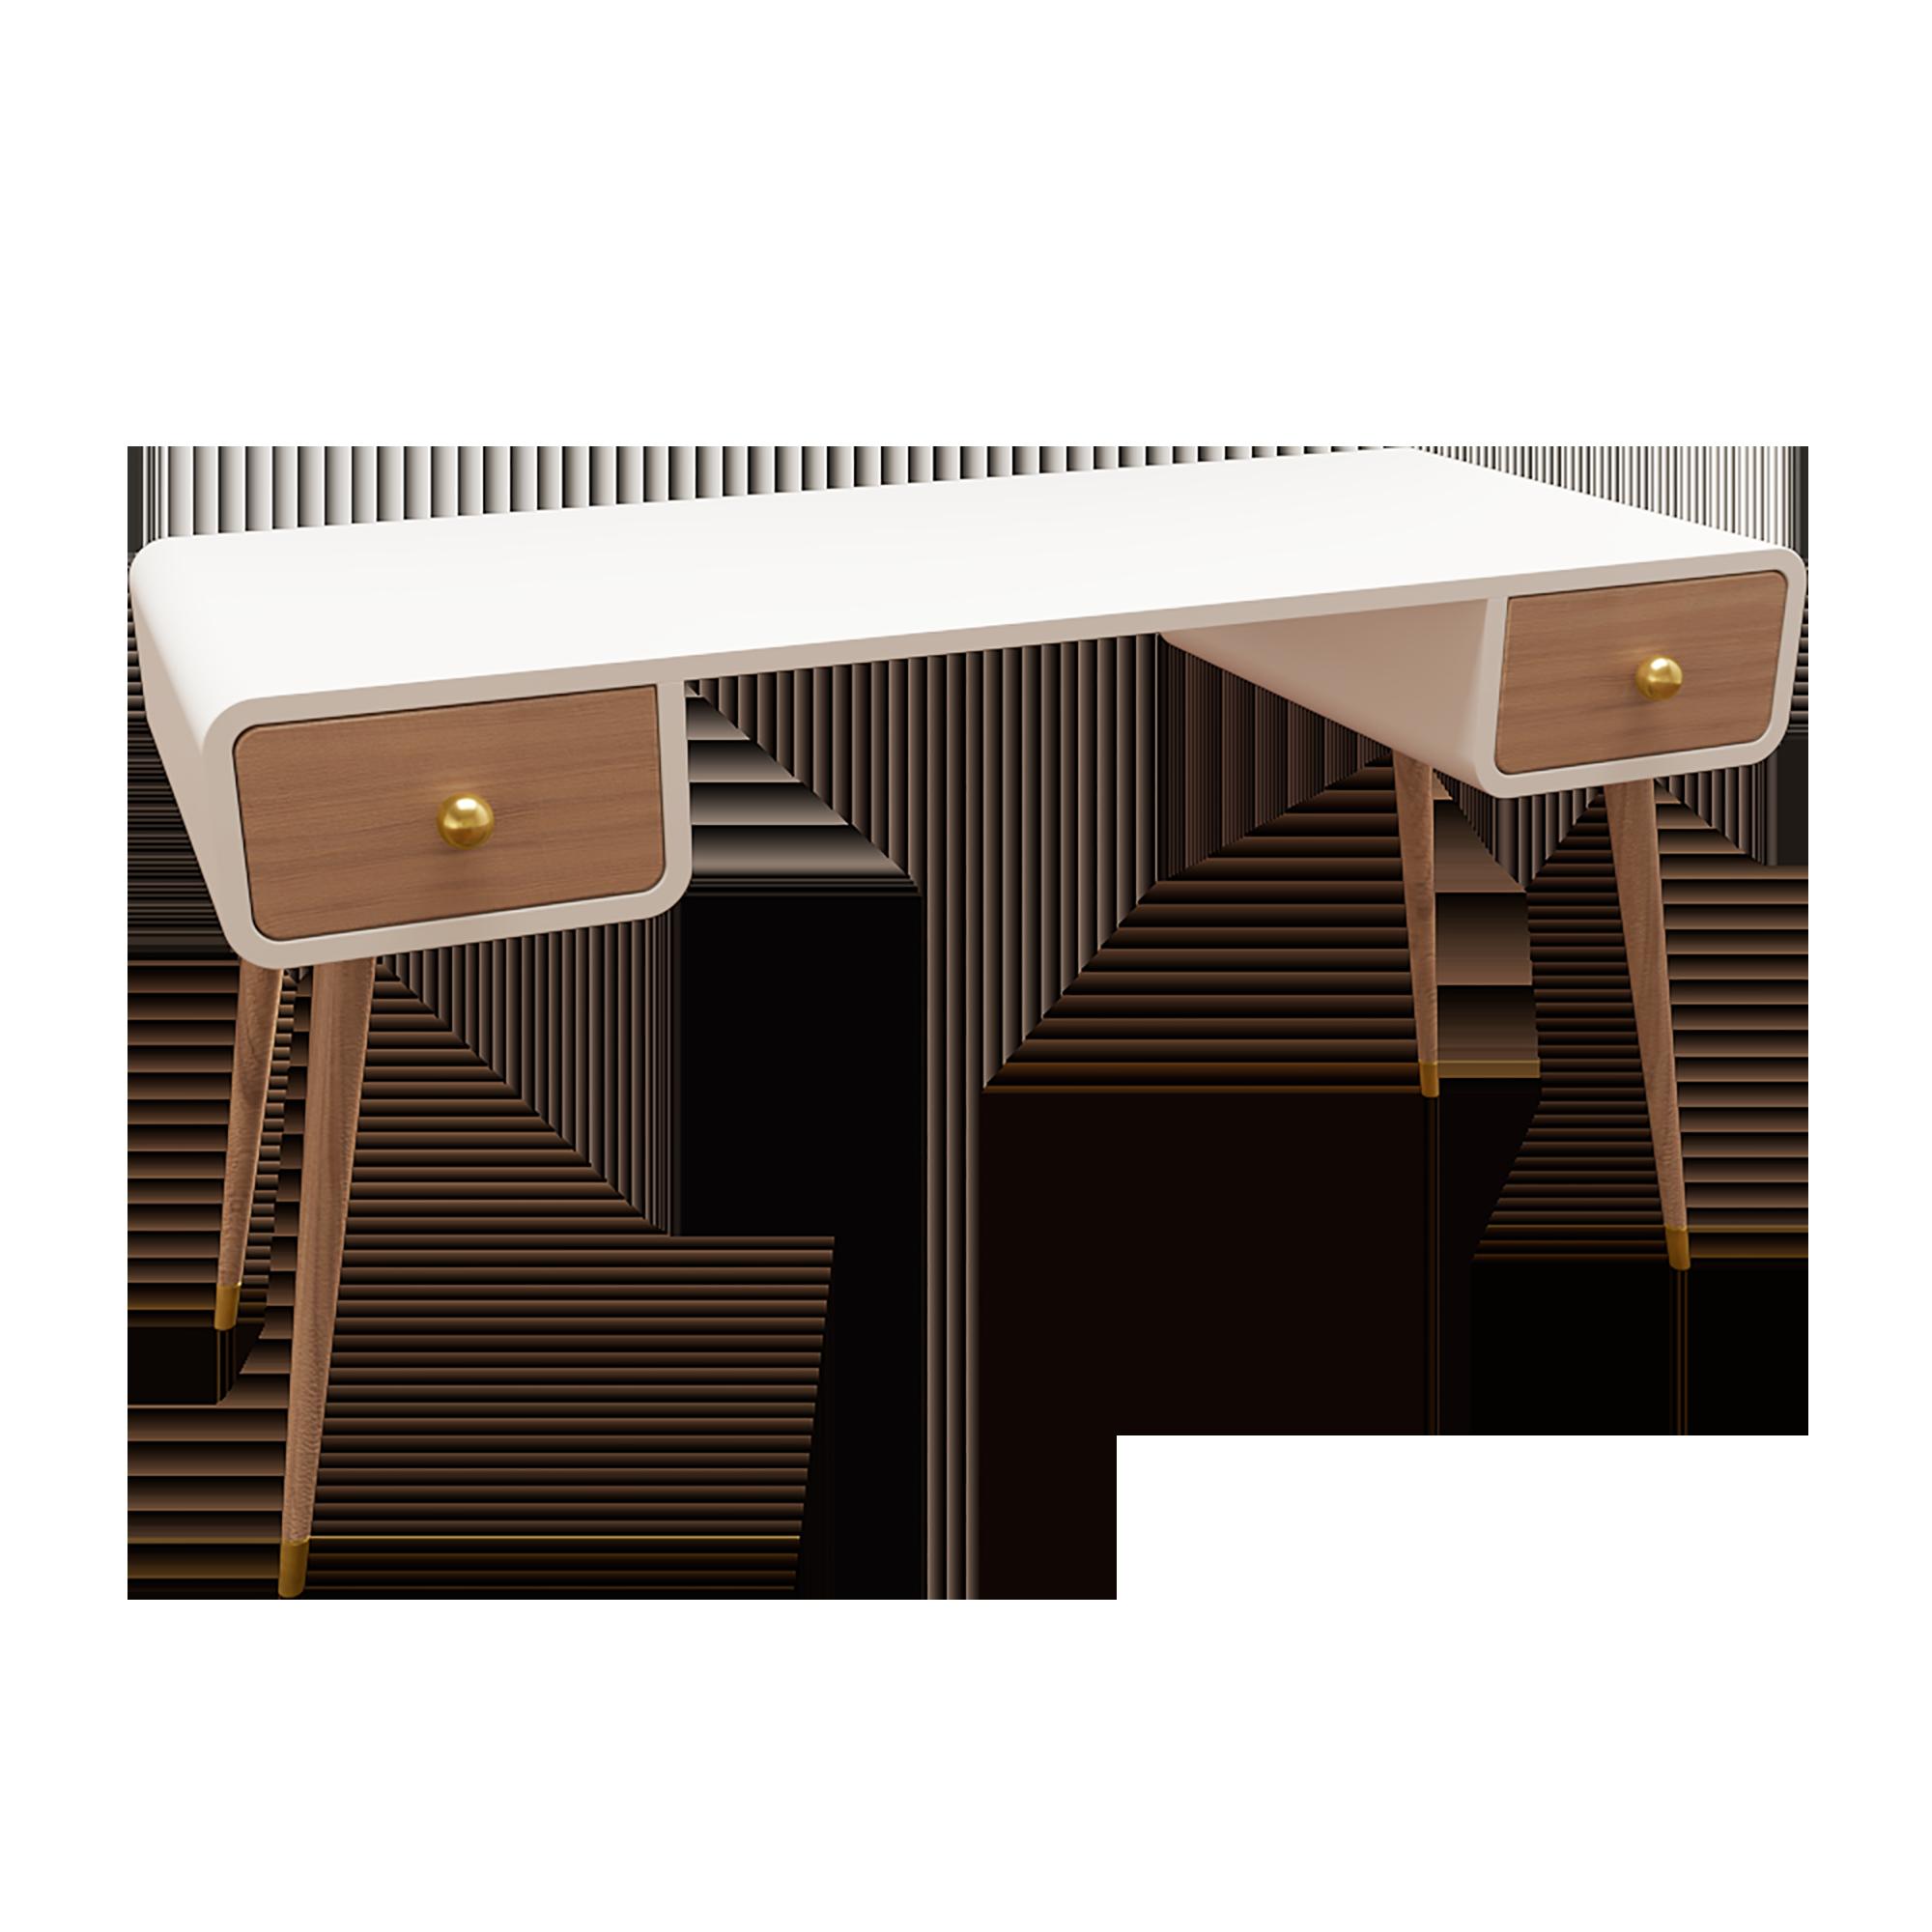 Письменный стол Any-Home P007 - P007 | AnyHome.ru